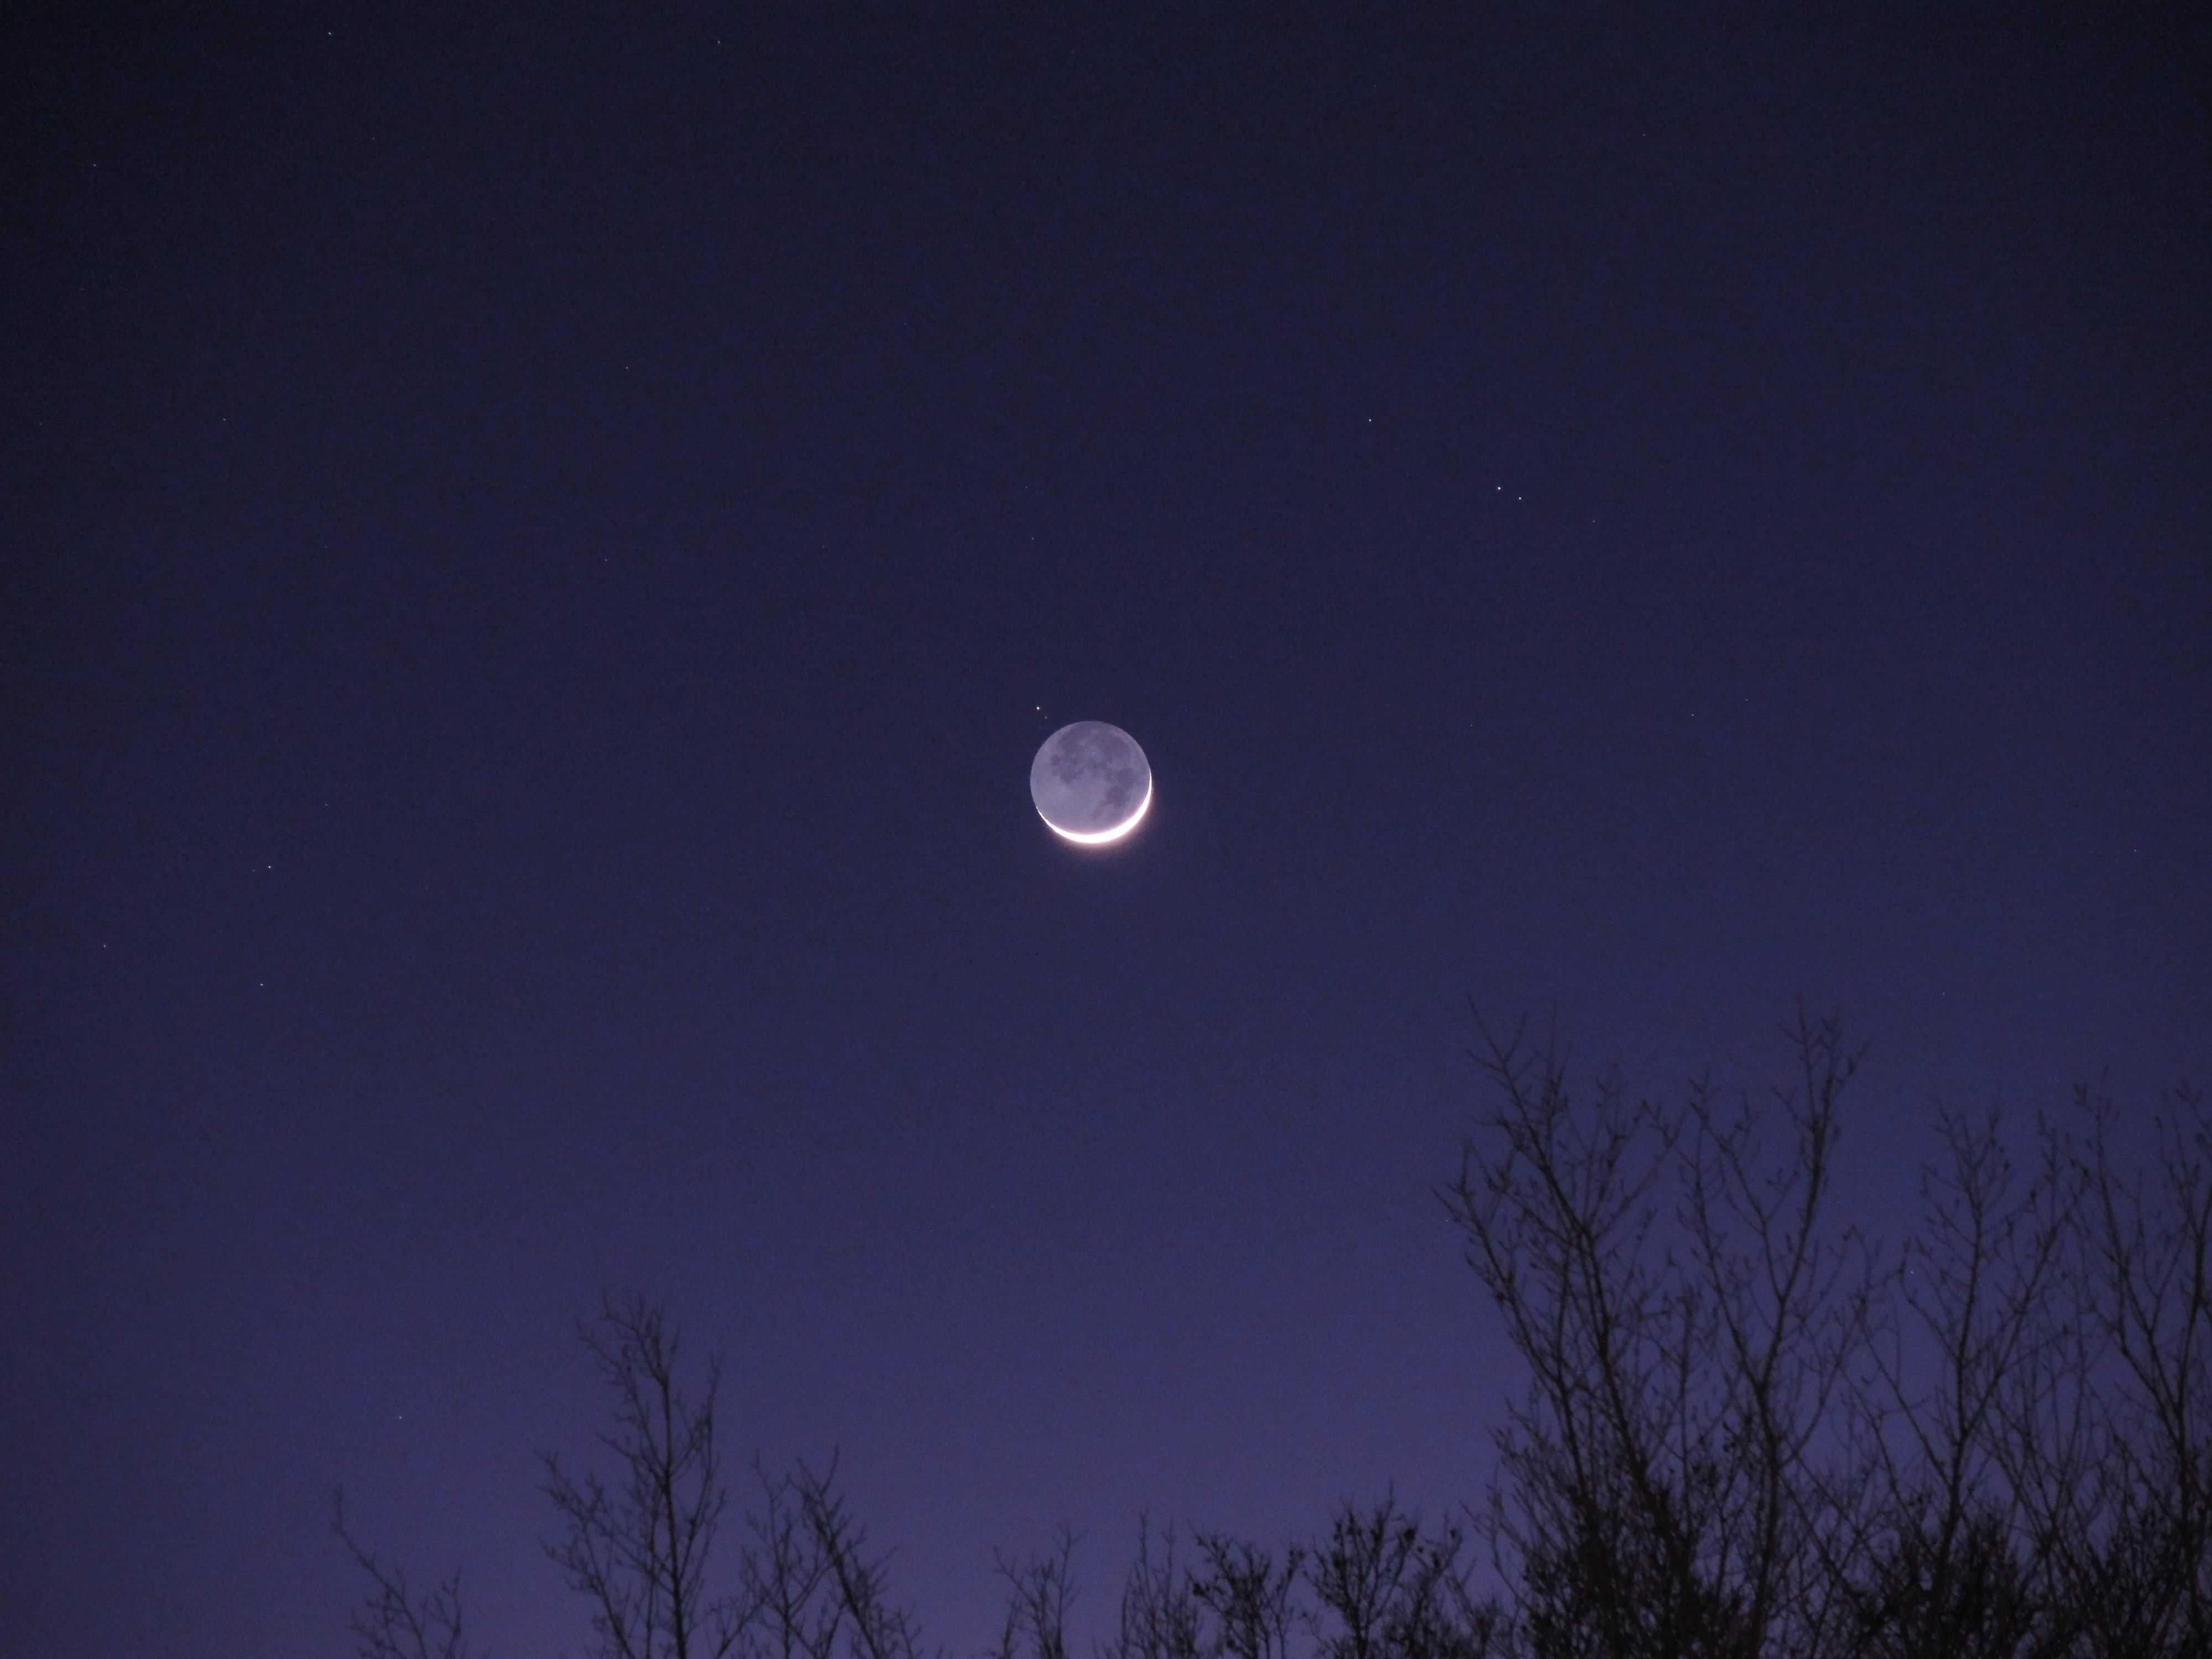 цикла растущей луны